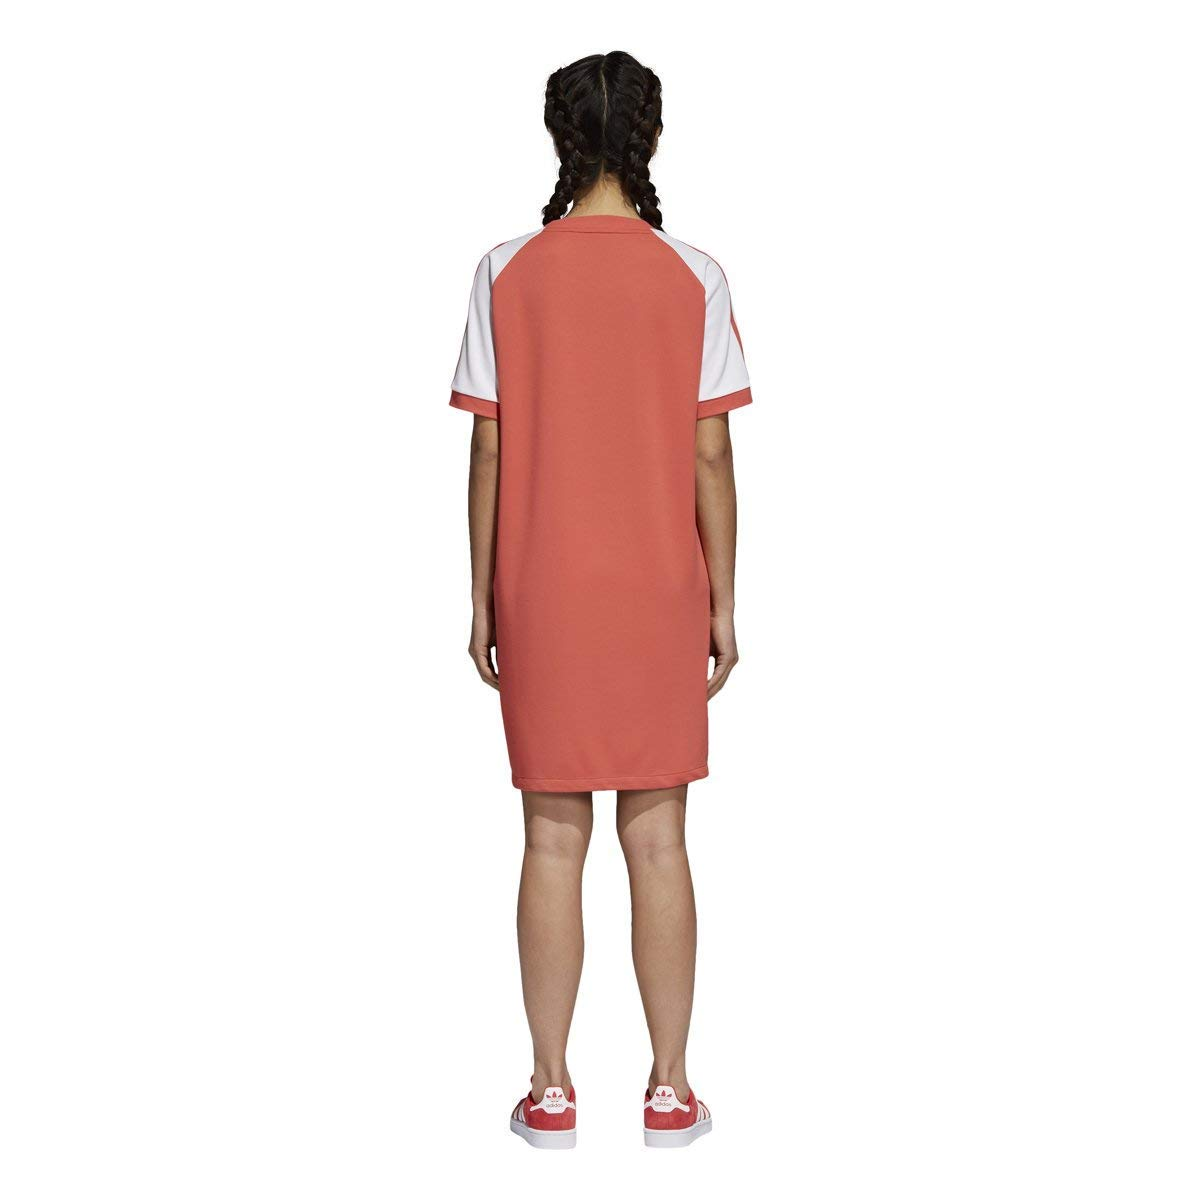 8b086f18 adidas Originals Womens Raglan Dress at Amazon Women's Clothing store: